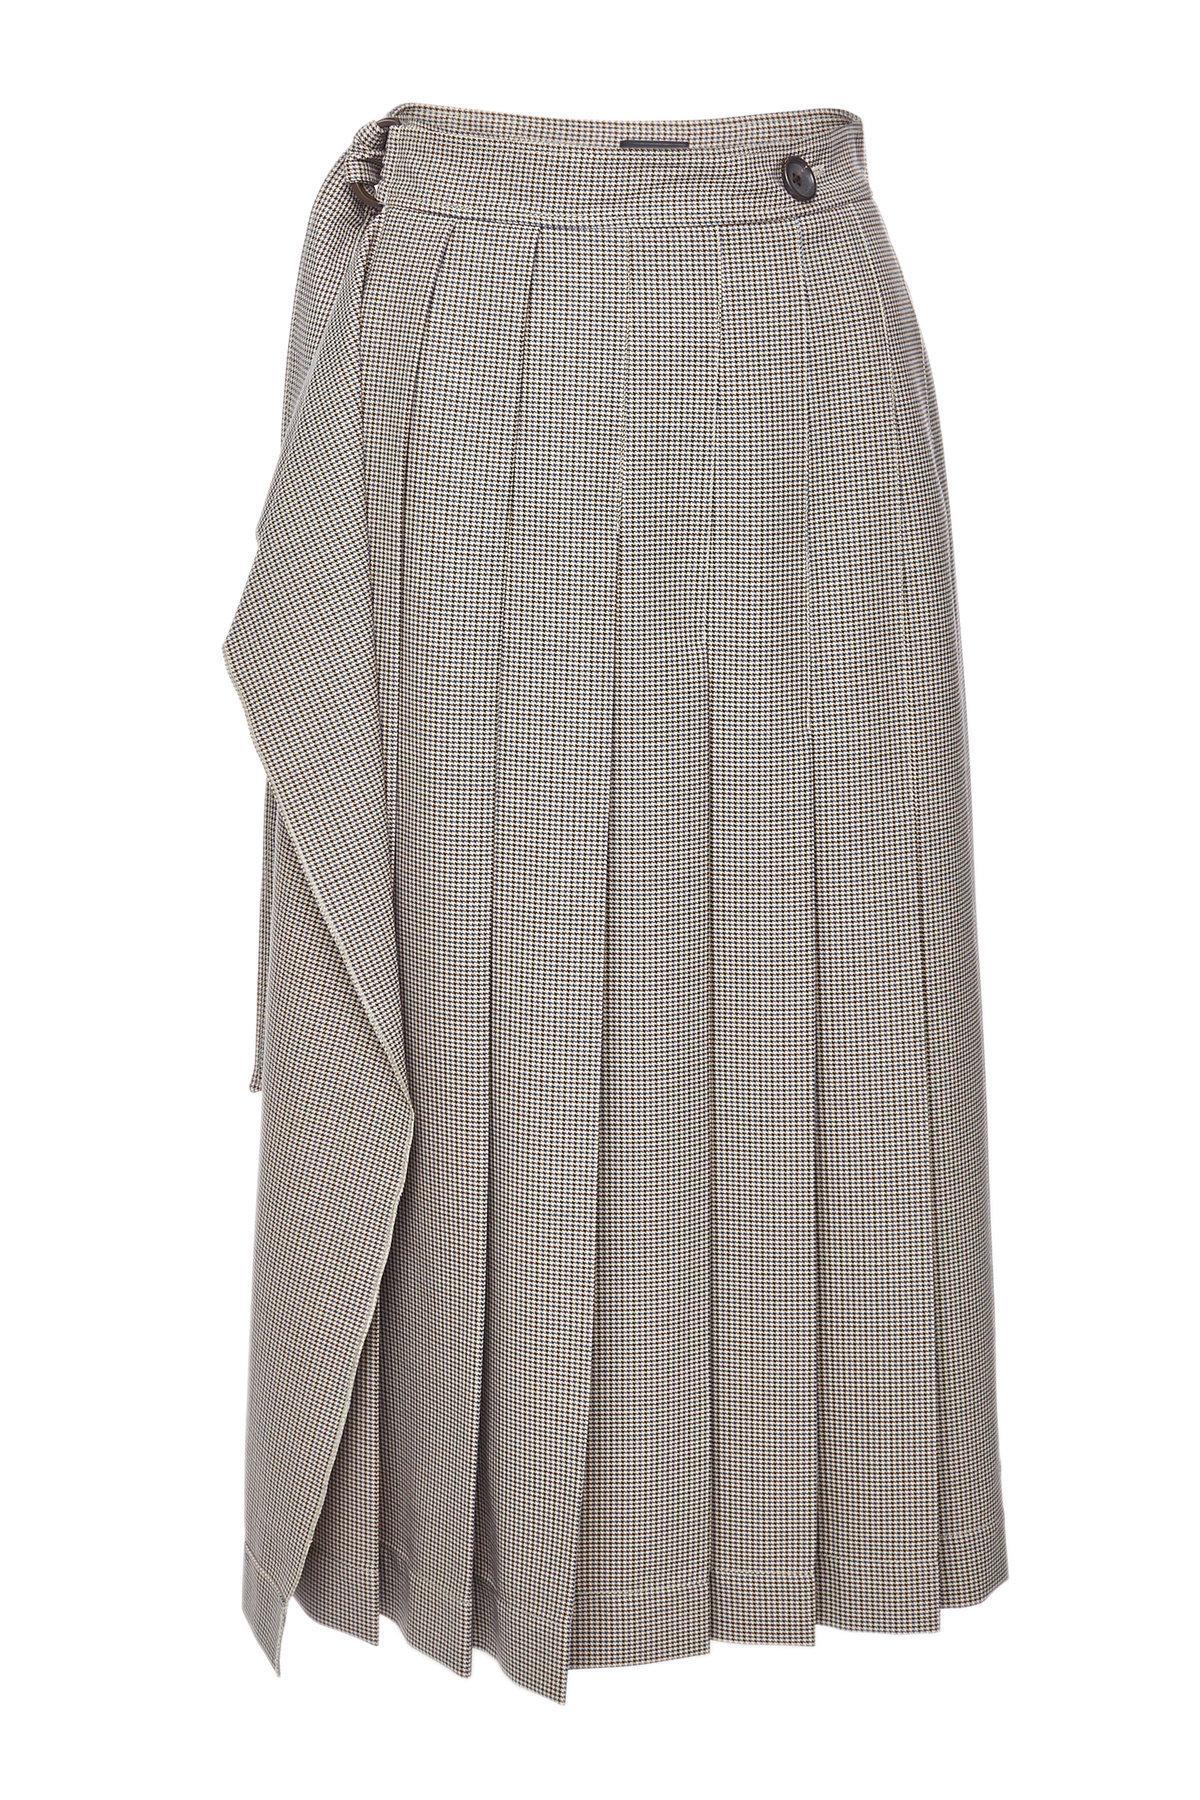 3234bc3b52 Joseph Fleet Checked Pleated Midi Skirt In Grey | ModeSens